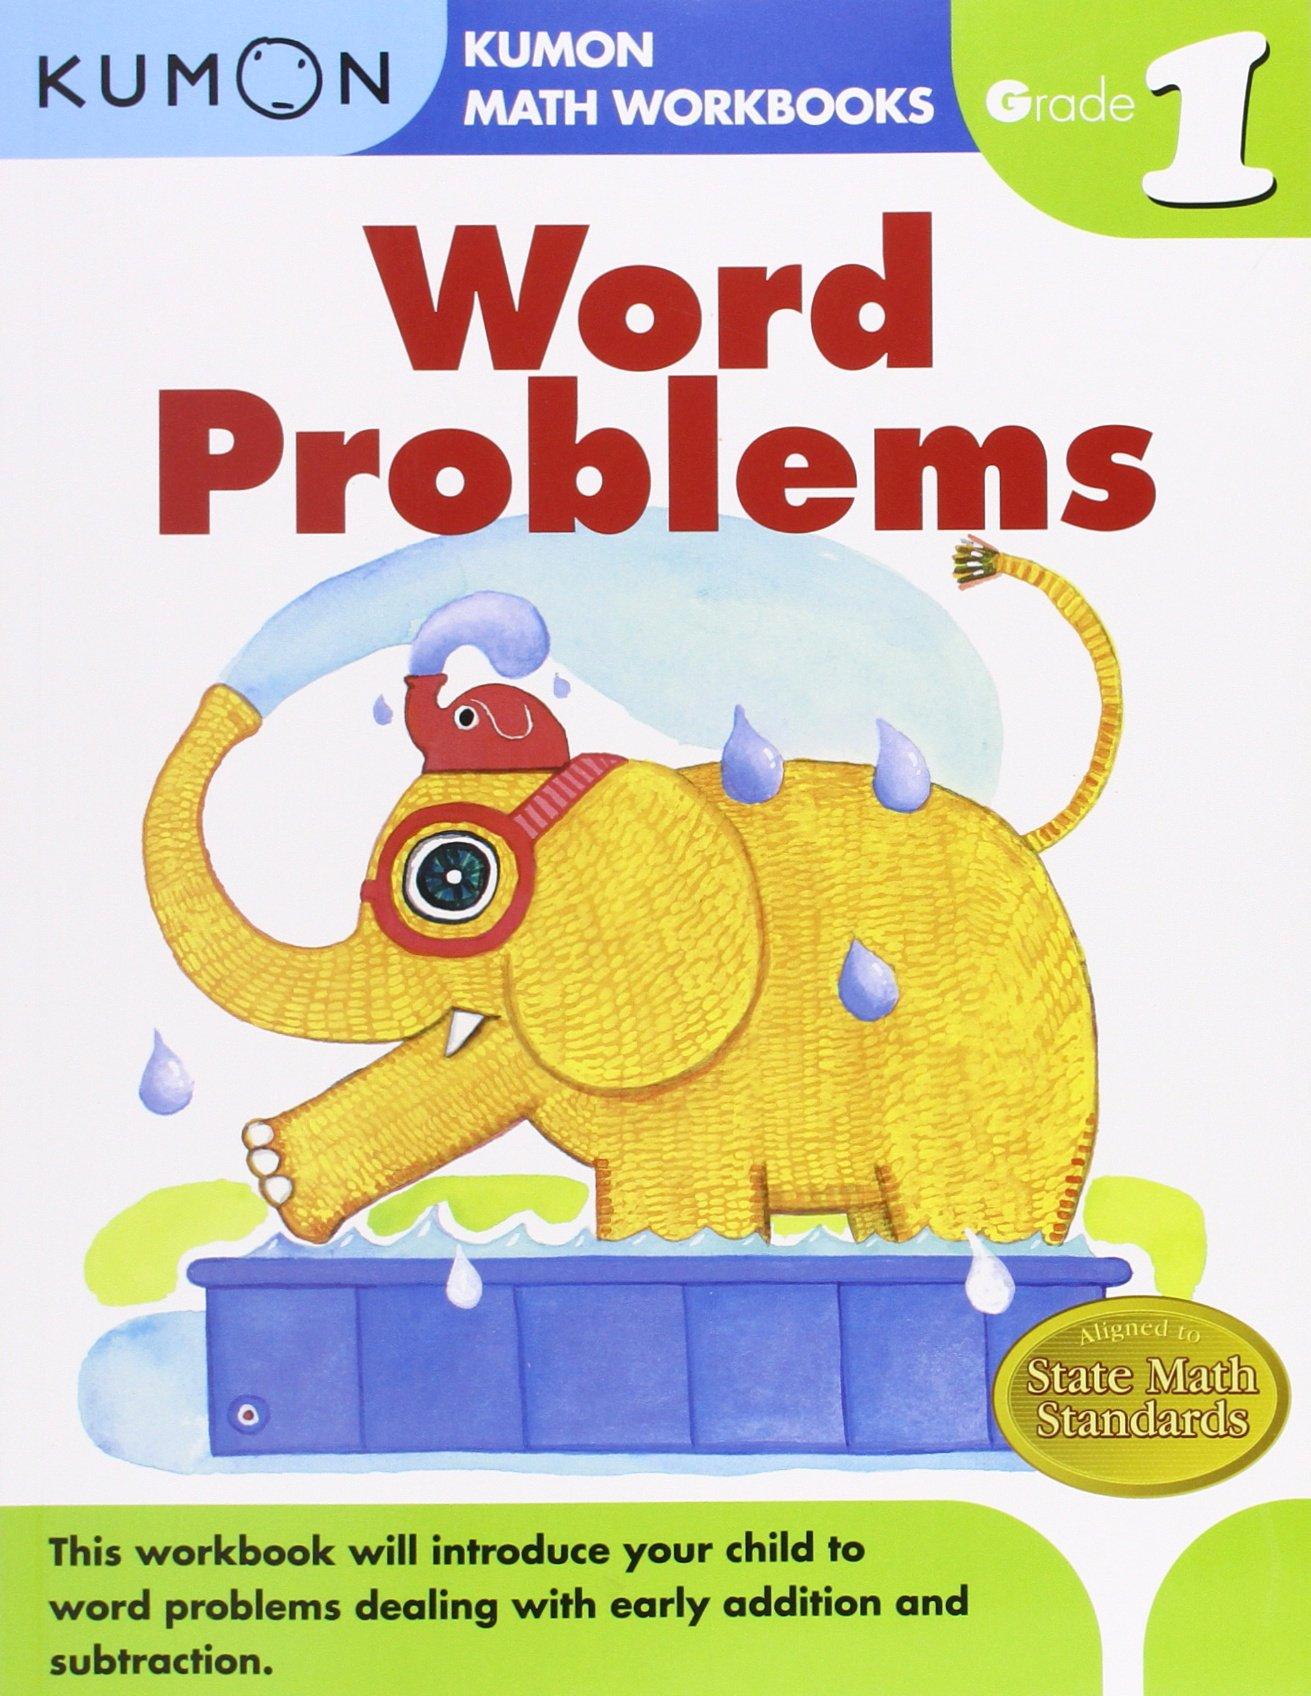 Worksheets Kumon Worksheets For Sale word problems grade 1 kumon math workbooks publishing 9781934968413 amazon com books